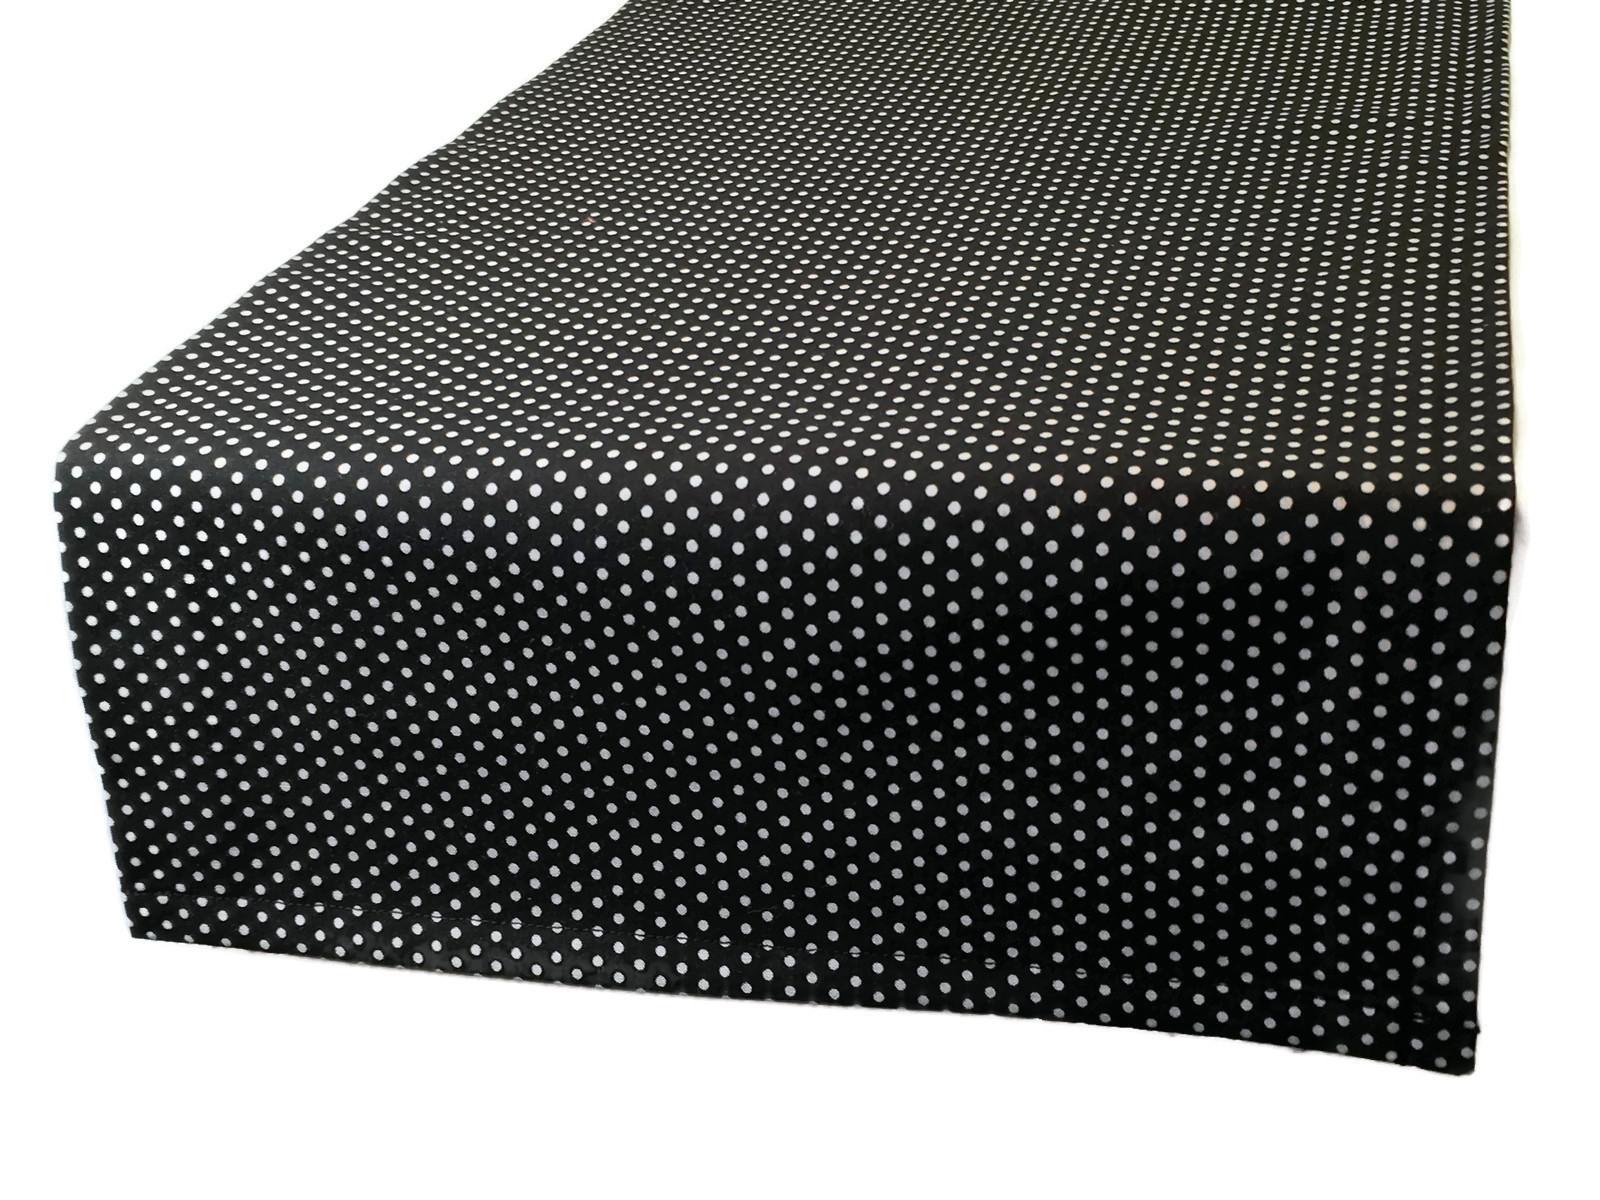 Polka Dot Cloth Table Runner